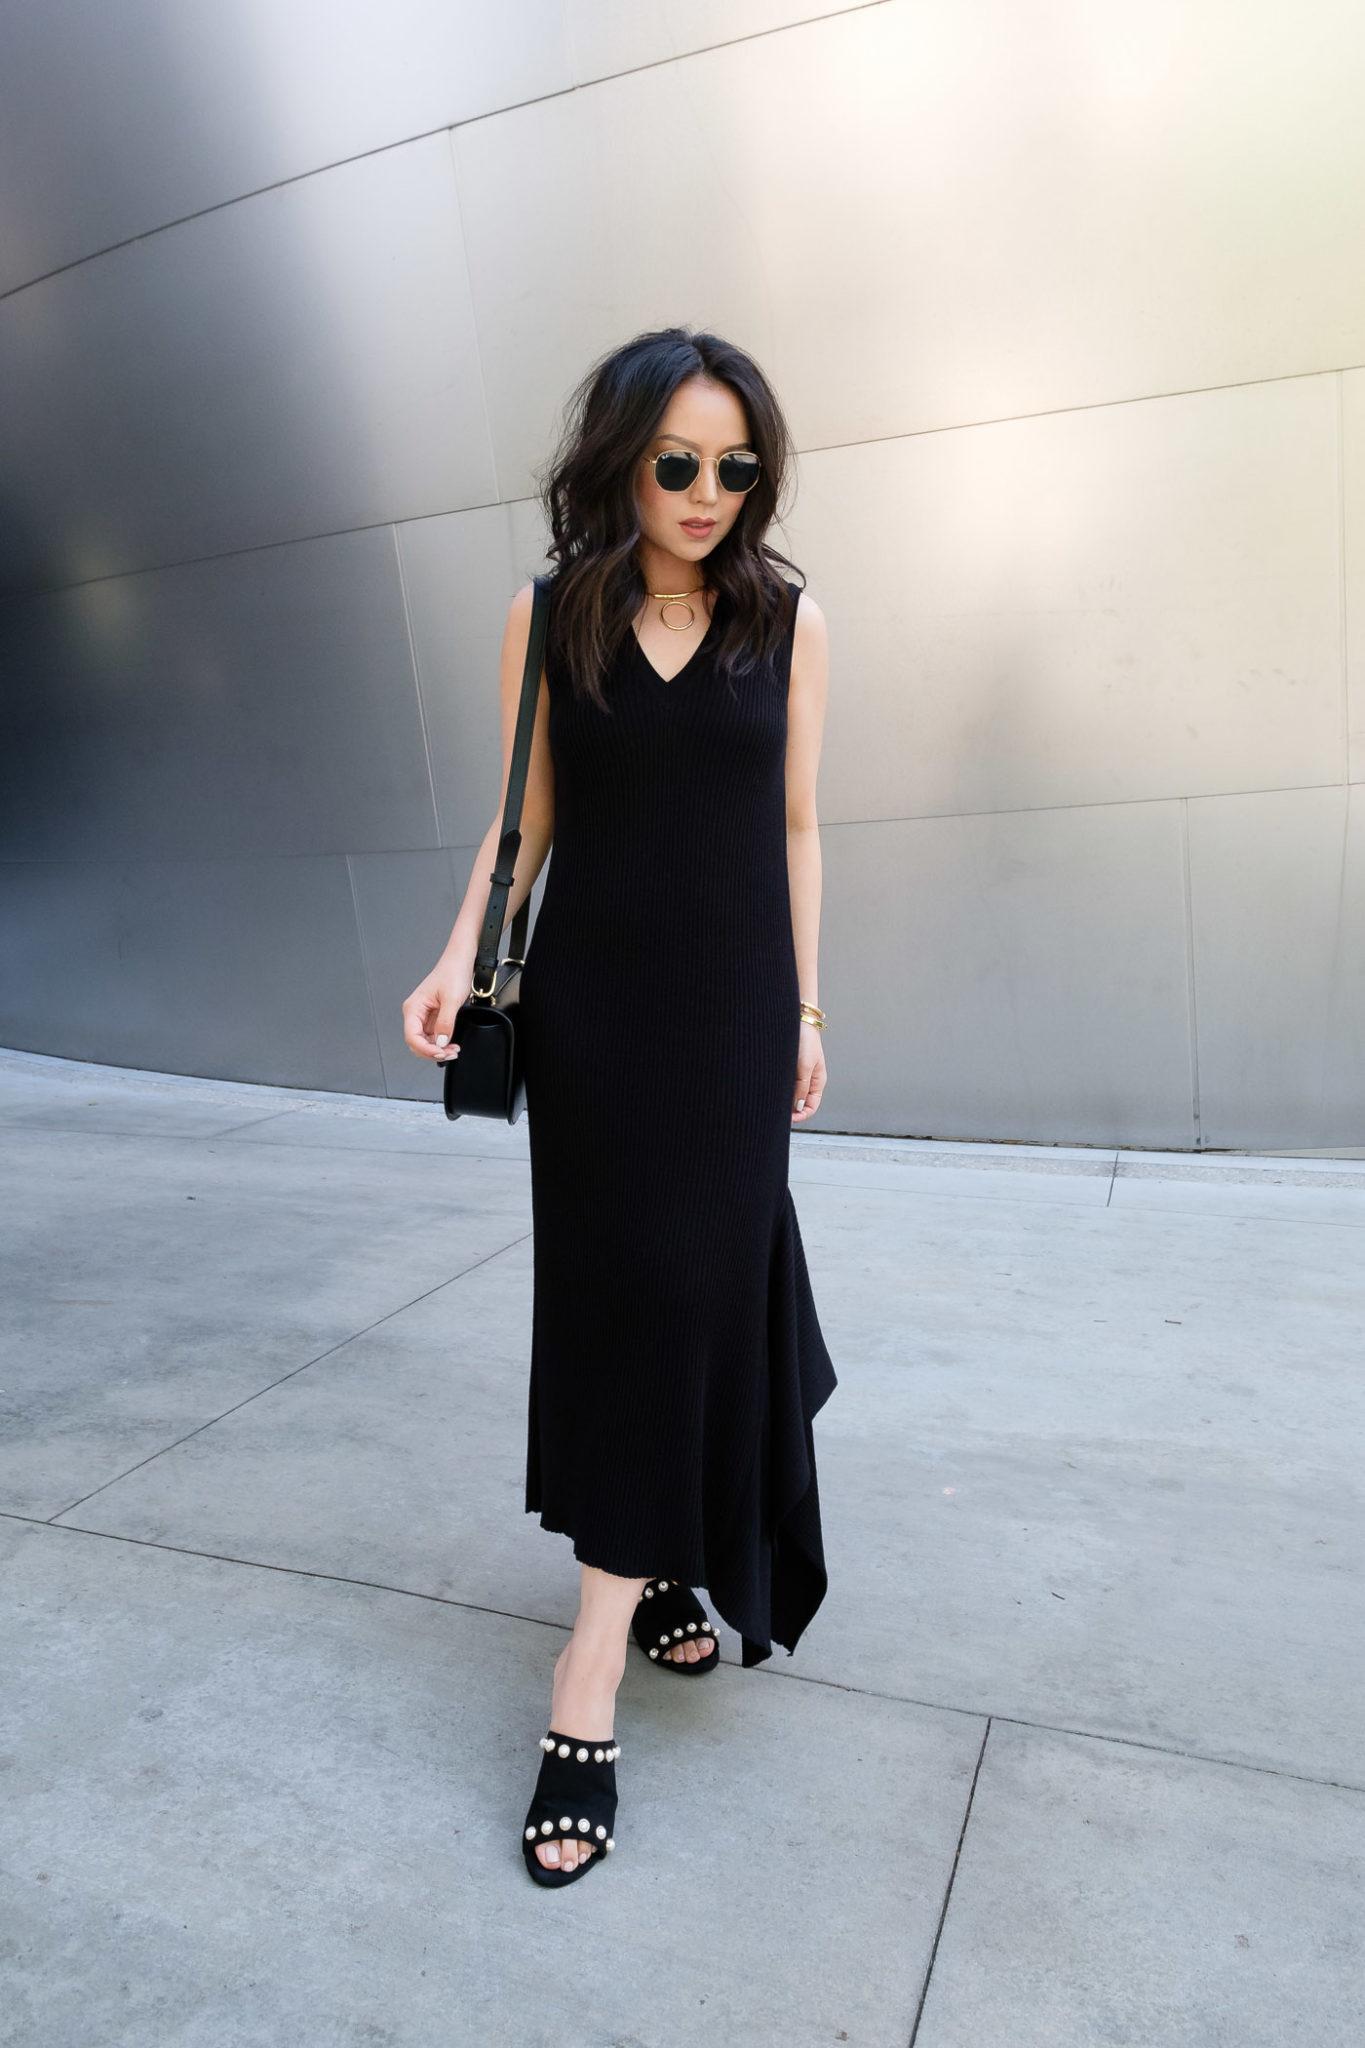 black-midi-dress-pearl-mules-san-francisco-fashion-blog-2